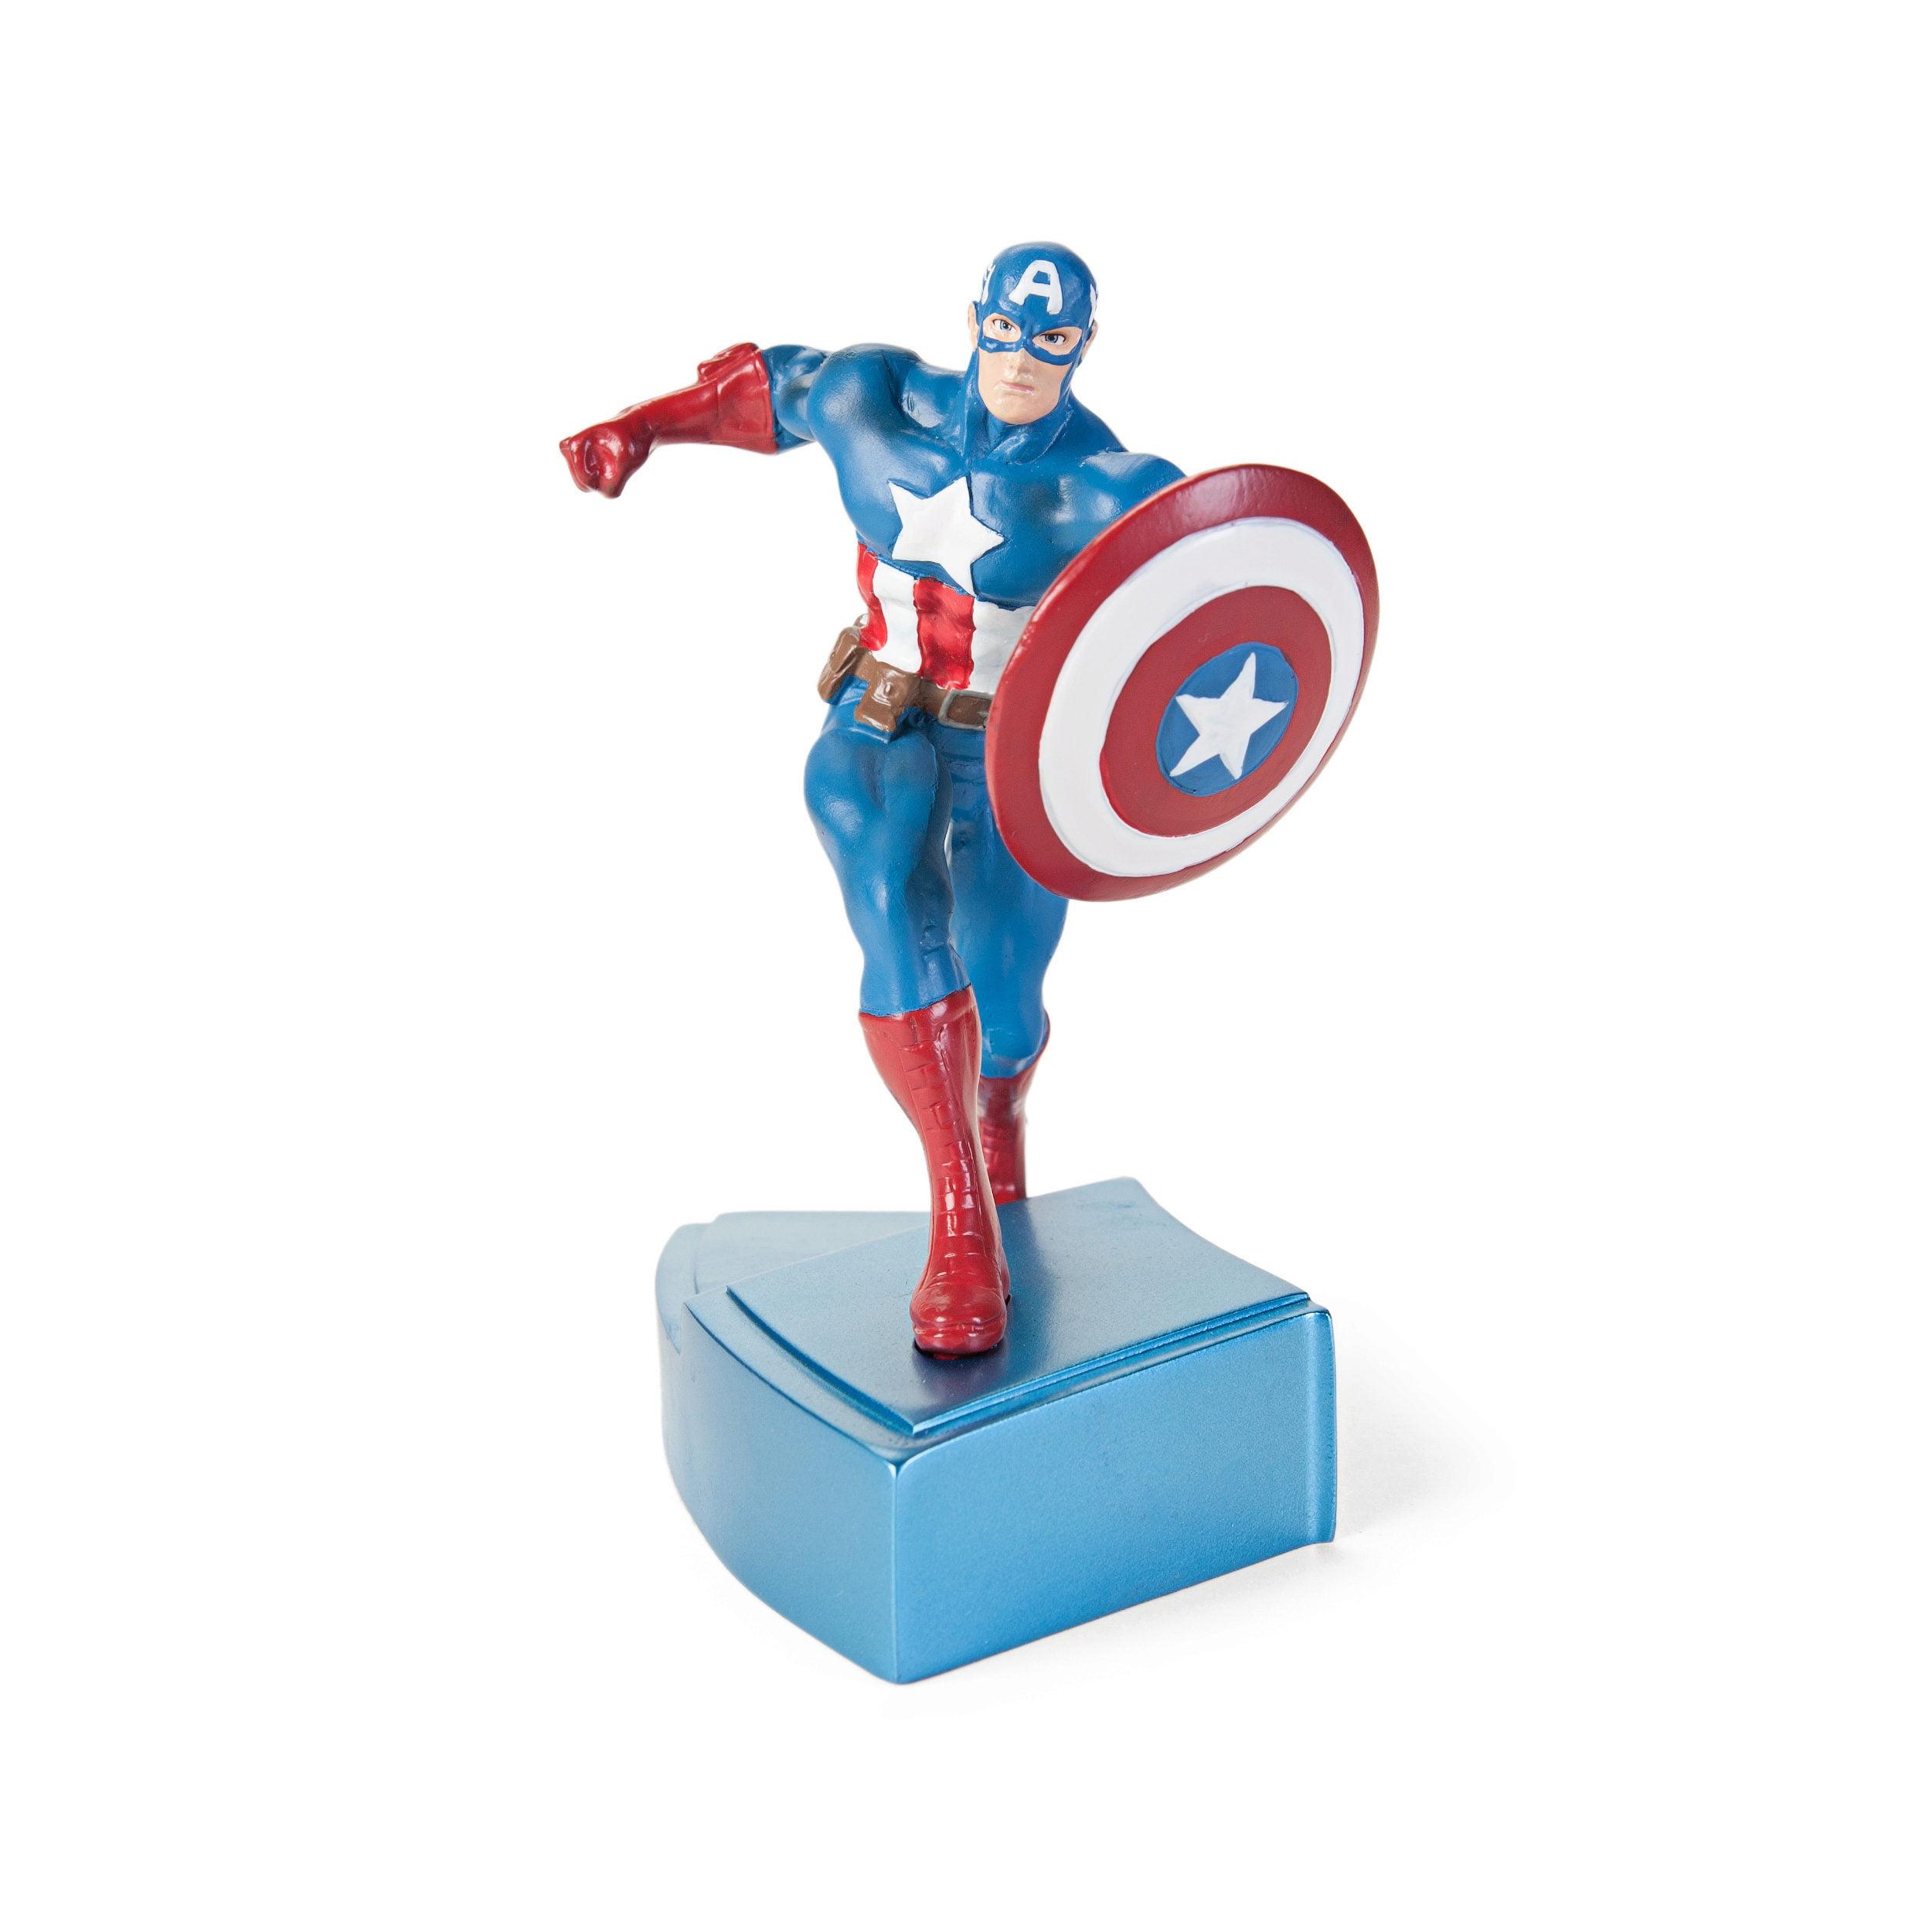 Marvel Avengers Captain America Paperweight Figure